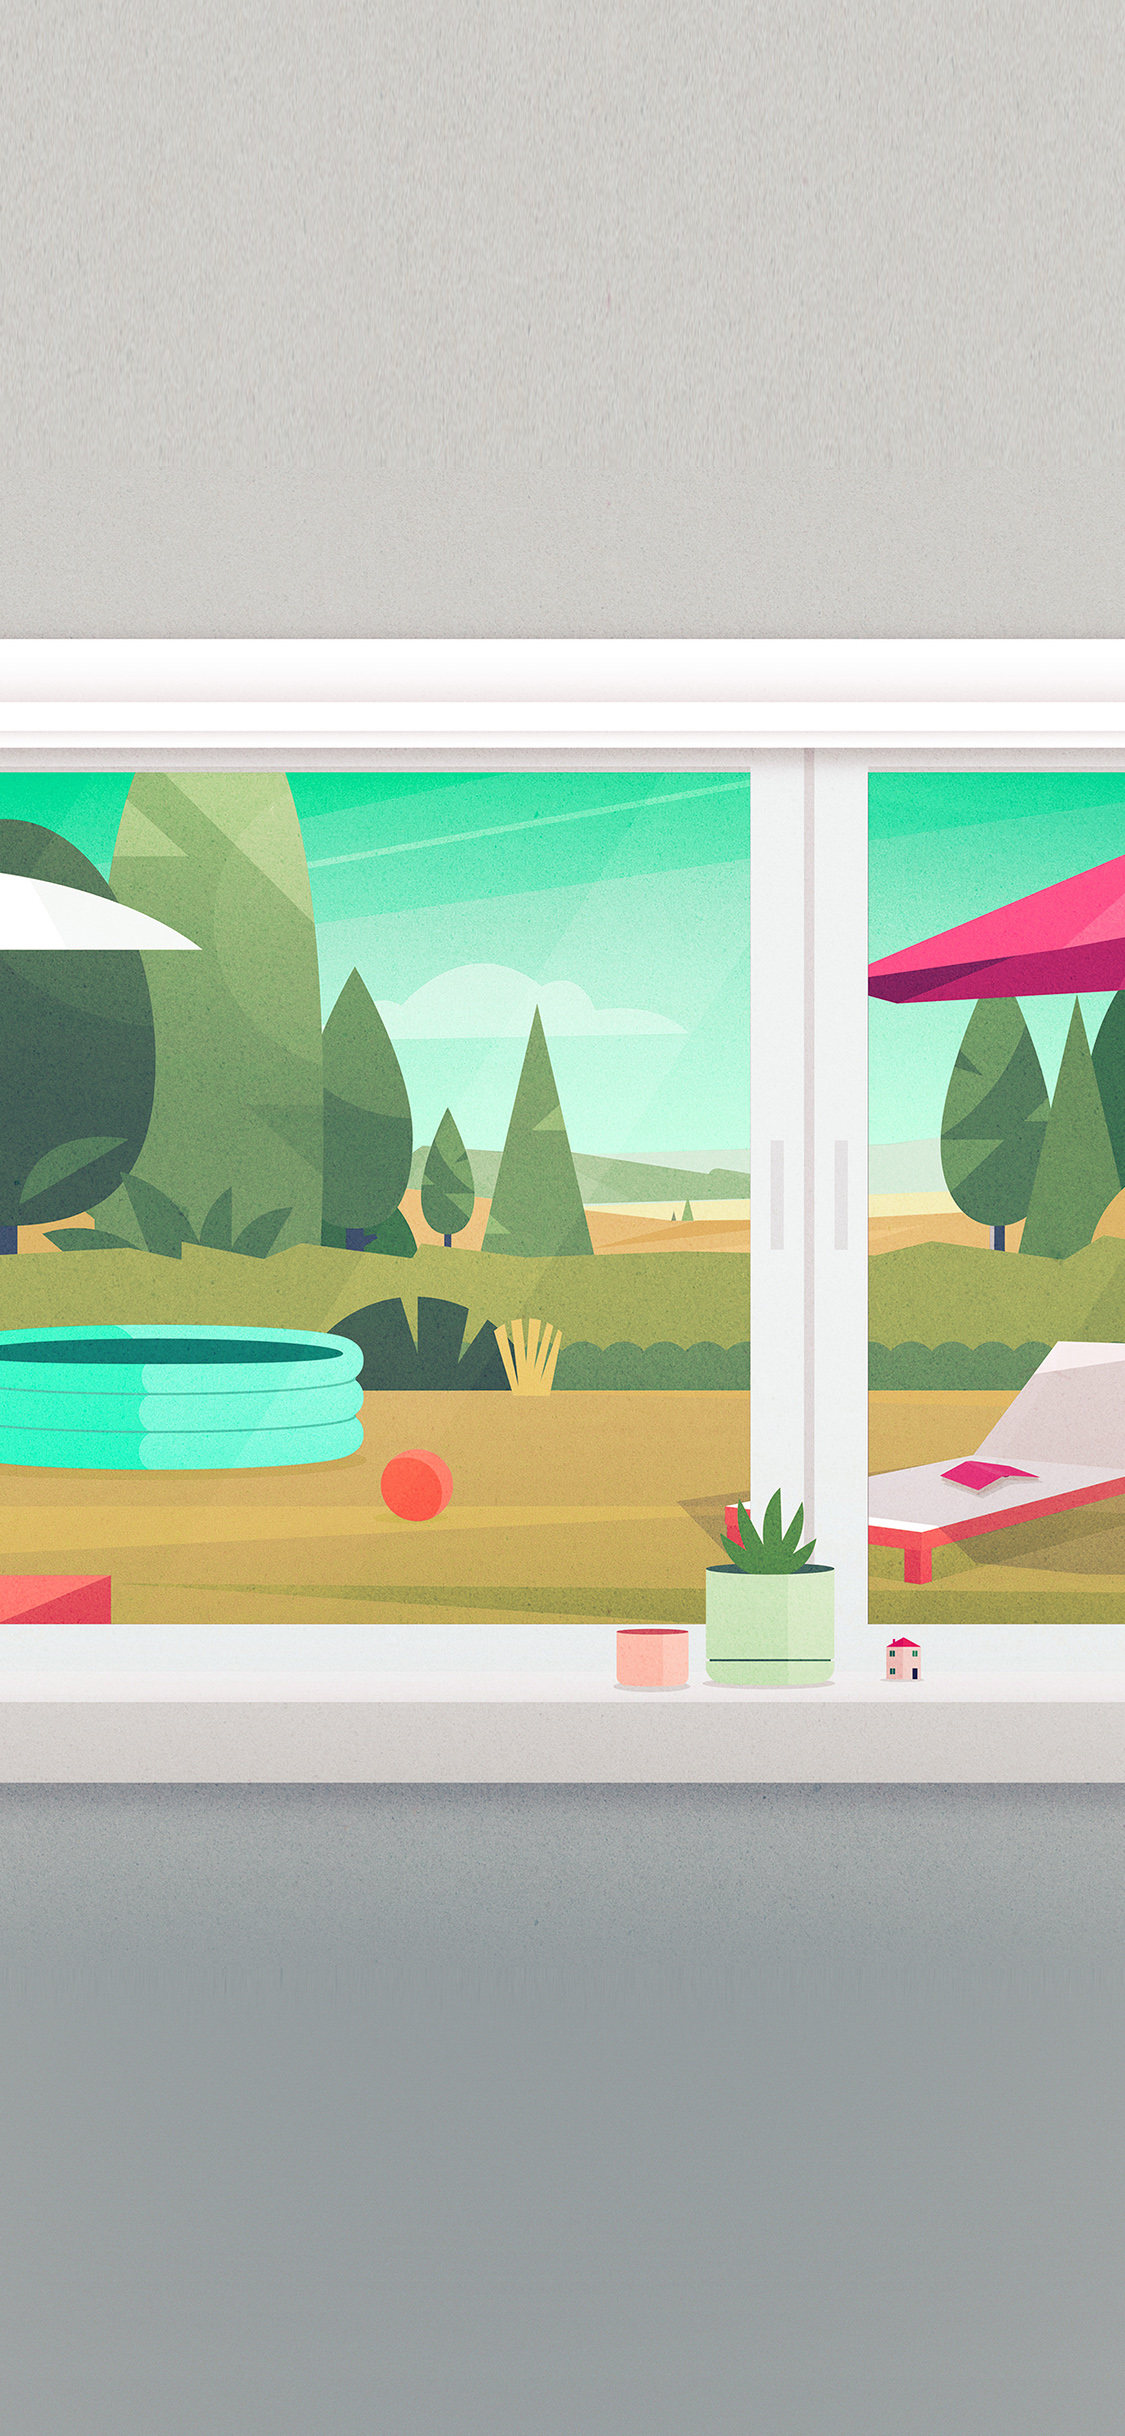 iPhonexpapers.com-Apple-iPhone-wallpaper-bb18-painting-digital-illustration-art-fall